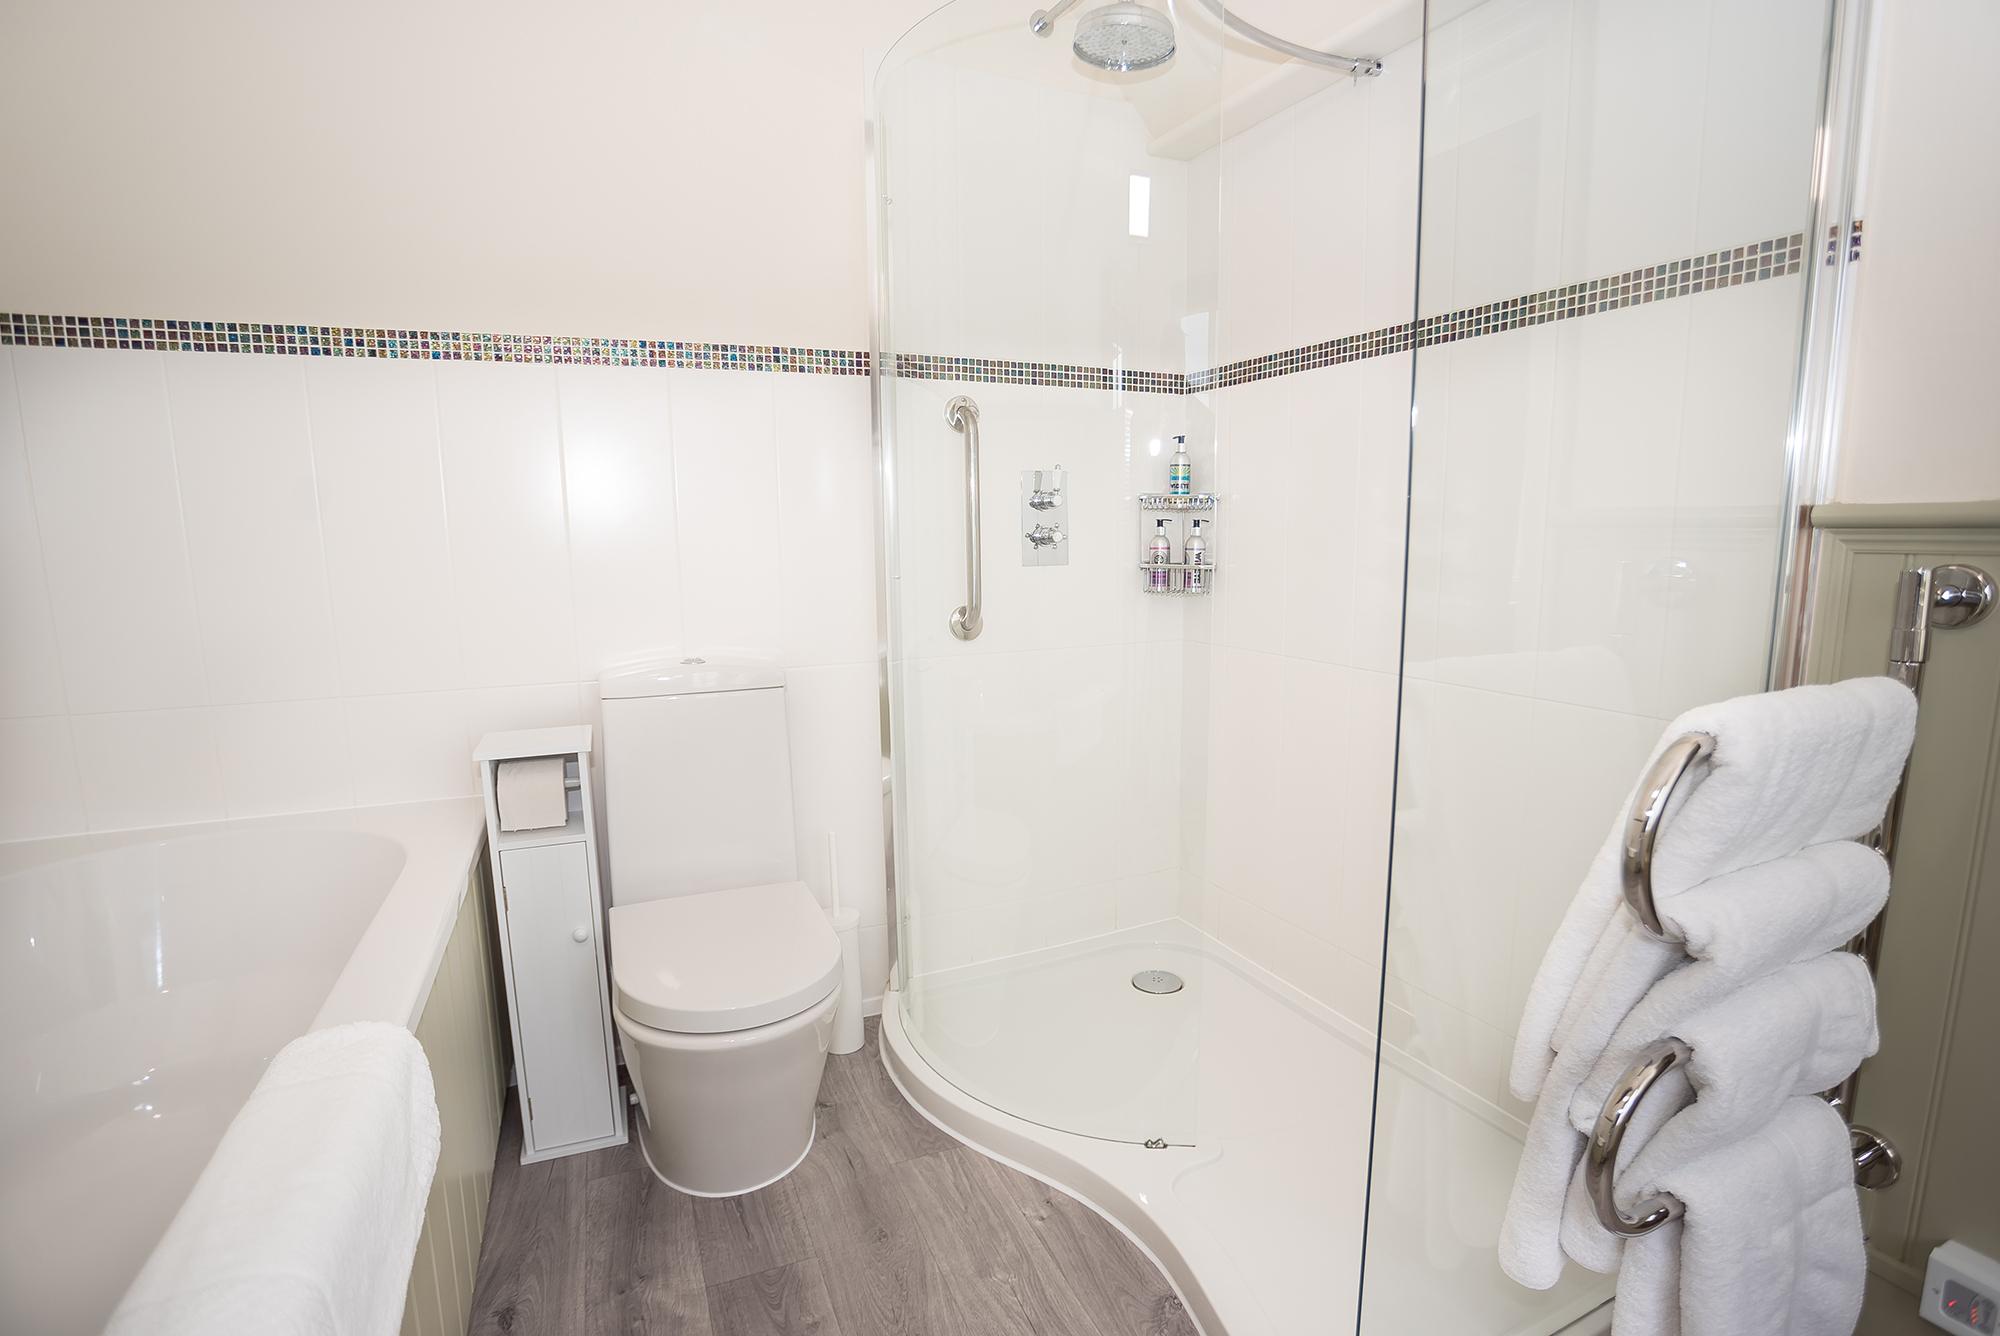 2nd bath room view